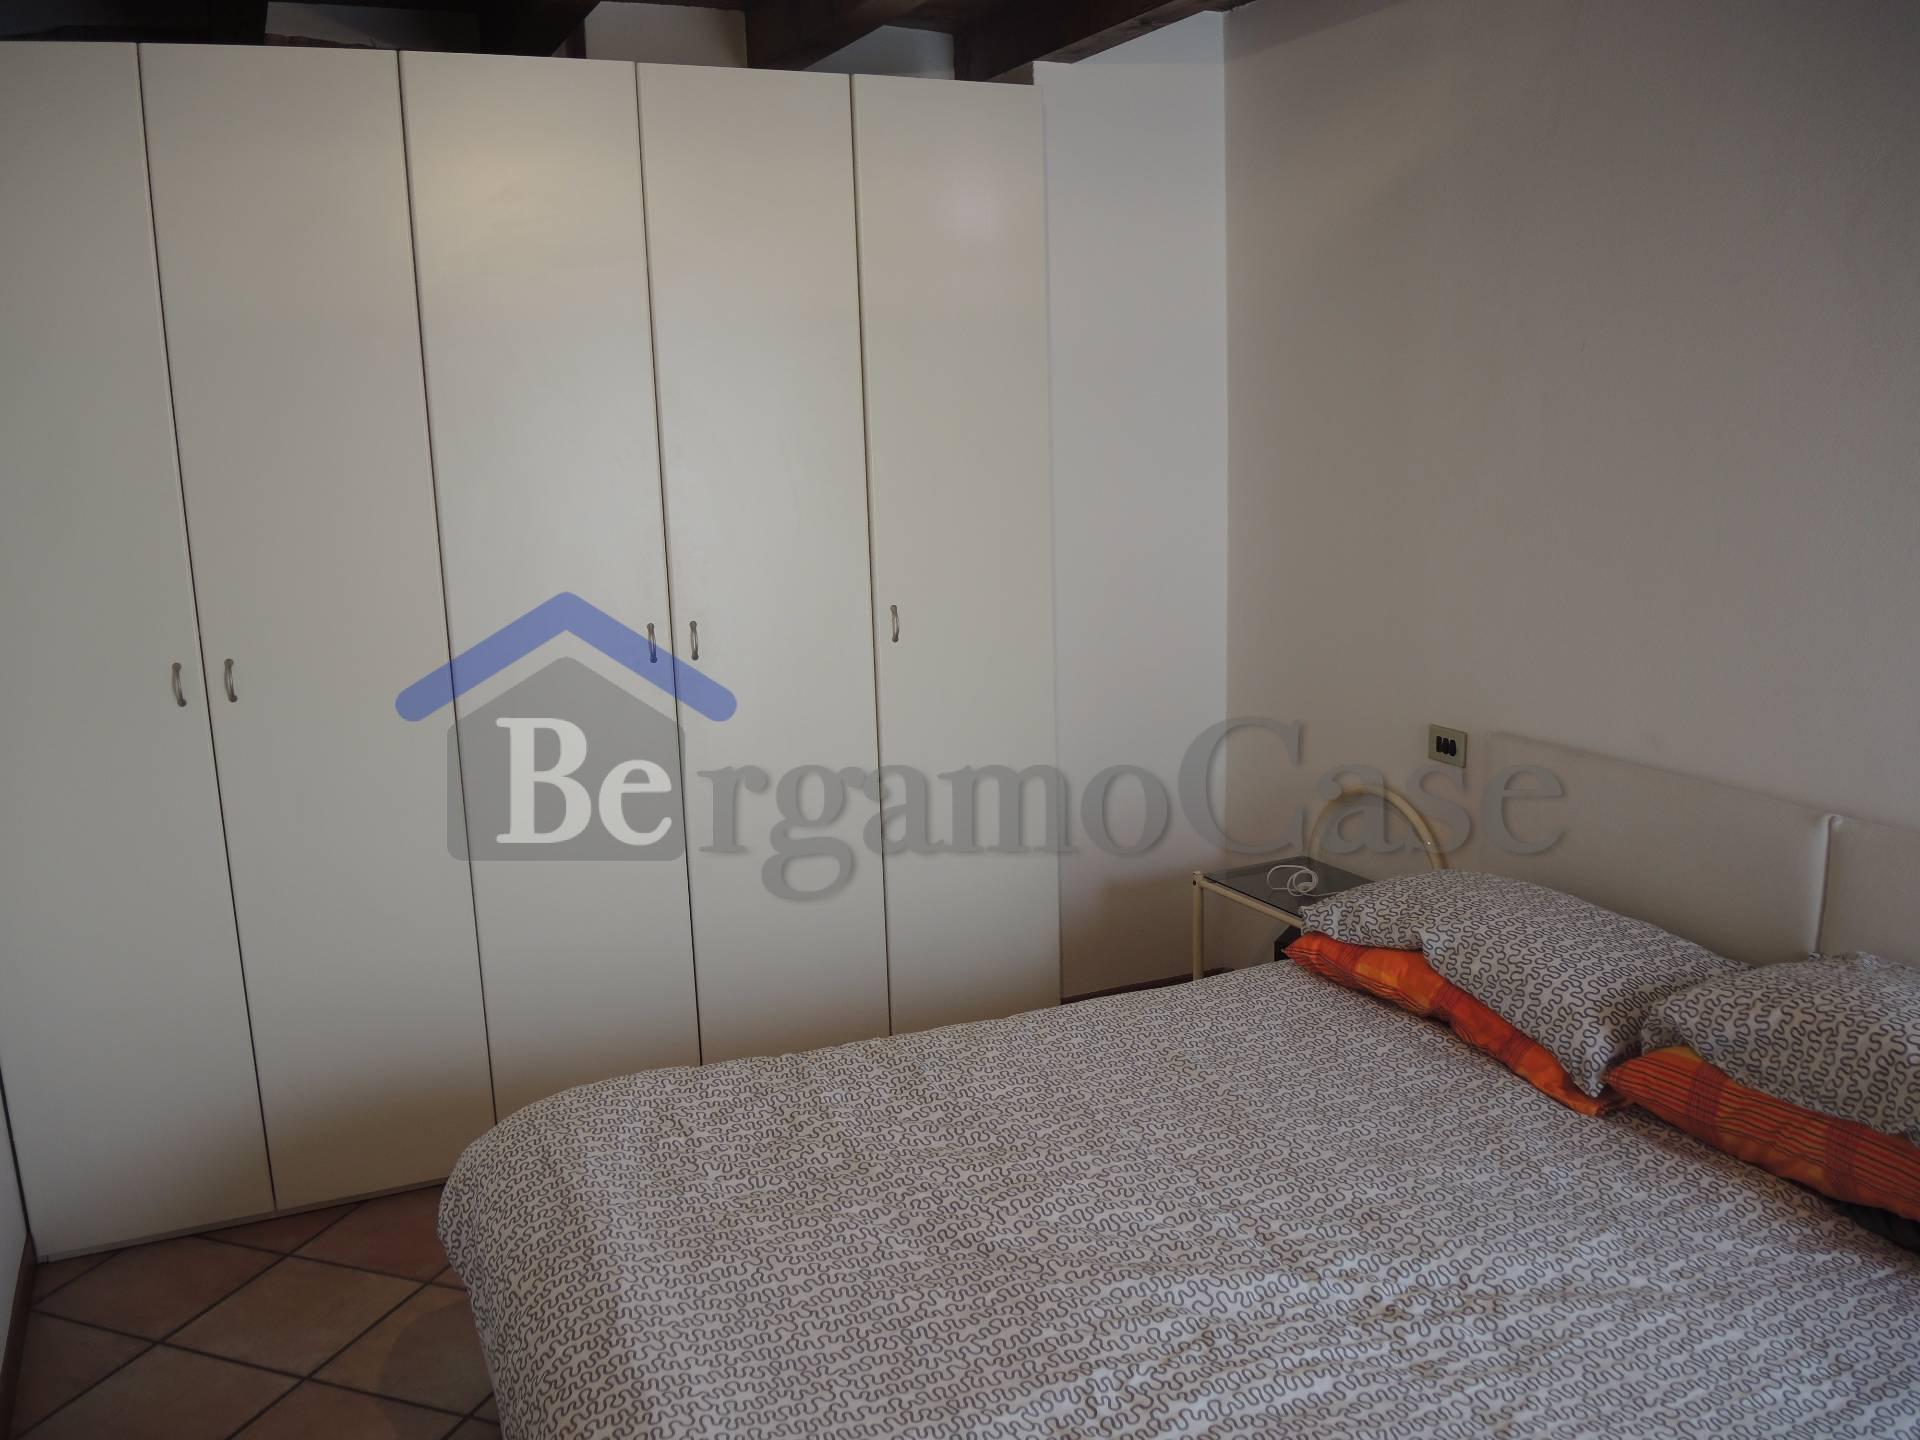 Bilocale Bergamo Via Sant'alessandro 6